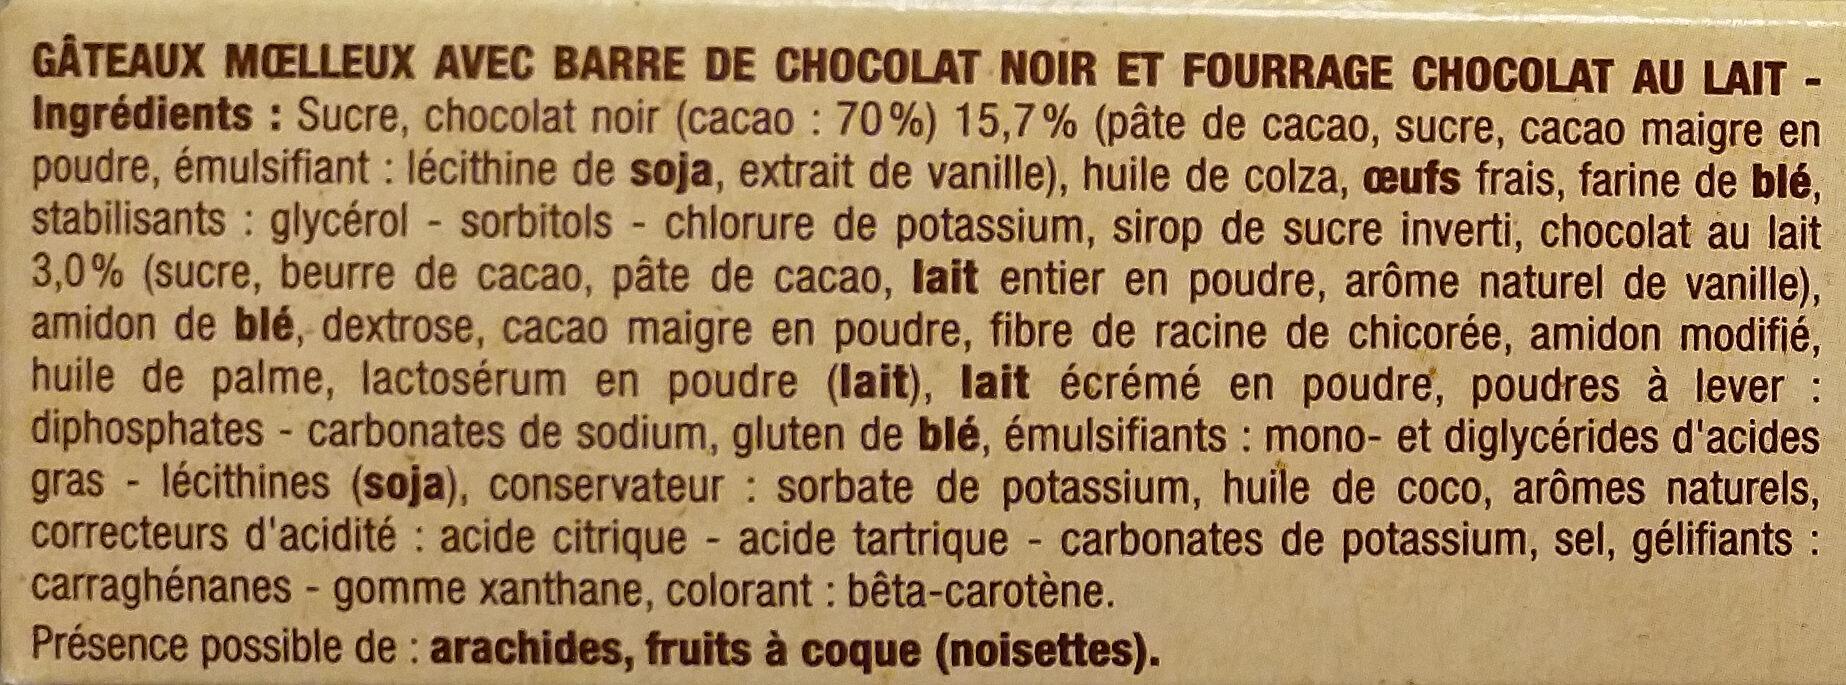 Crac&moi chocolat x5 - Ingrédients - fr